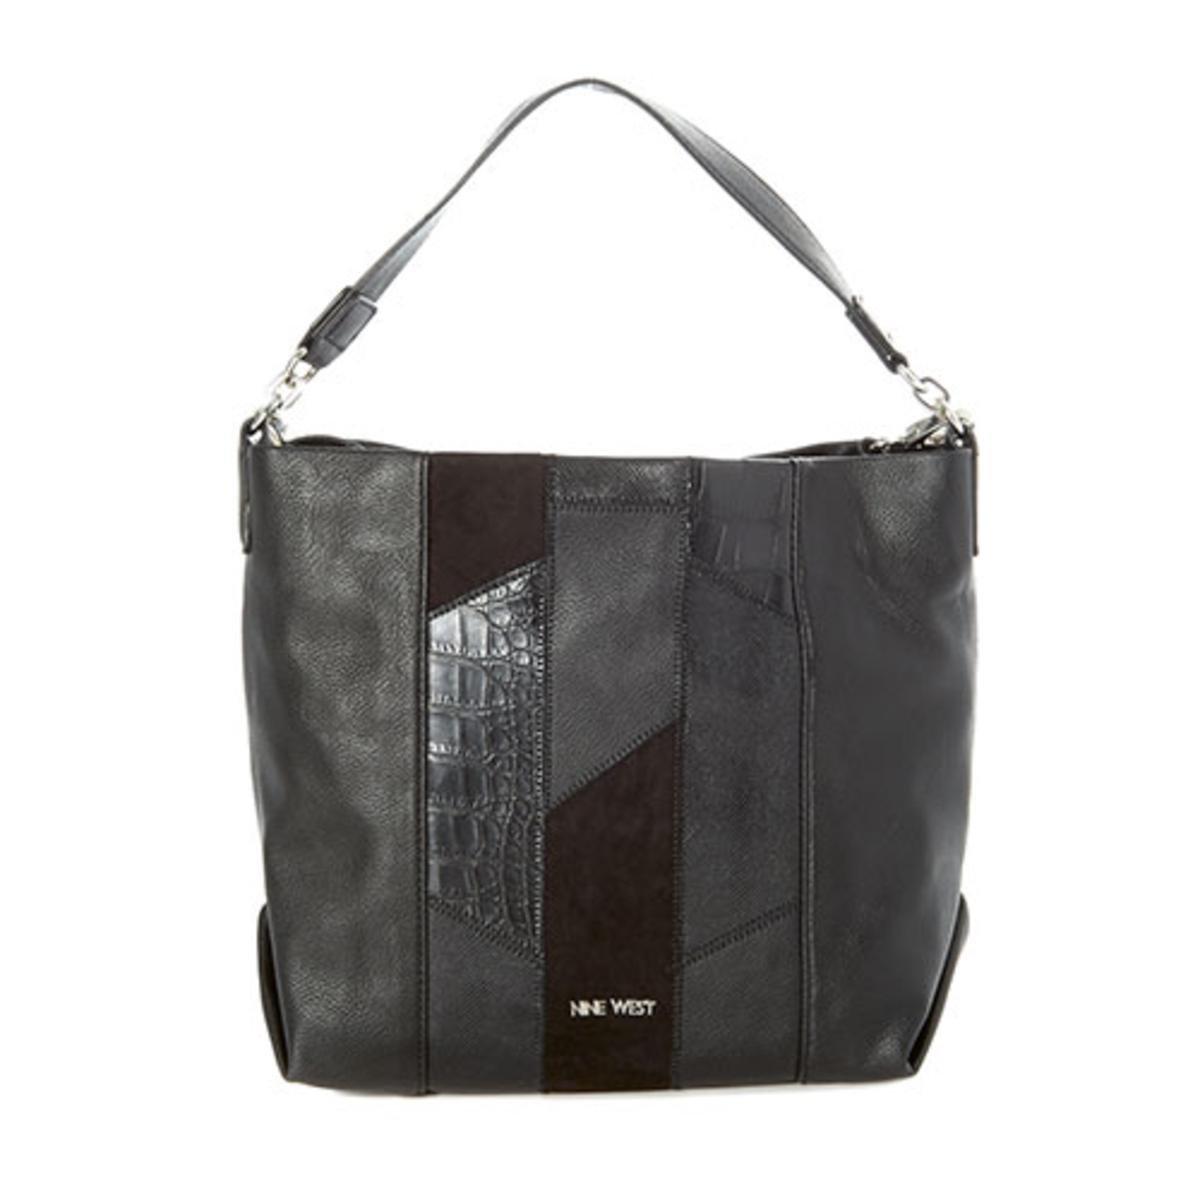 Nine West Womens Medley Up Faux Leather Convertible Hobo Handbag Black Large